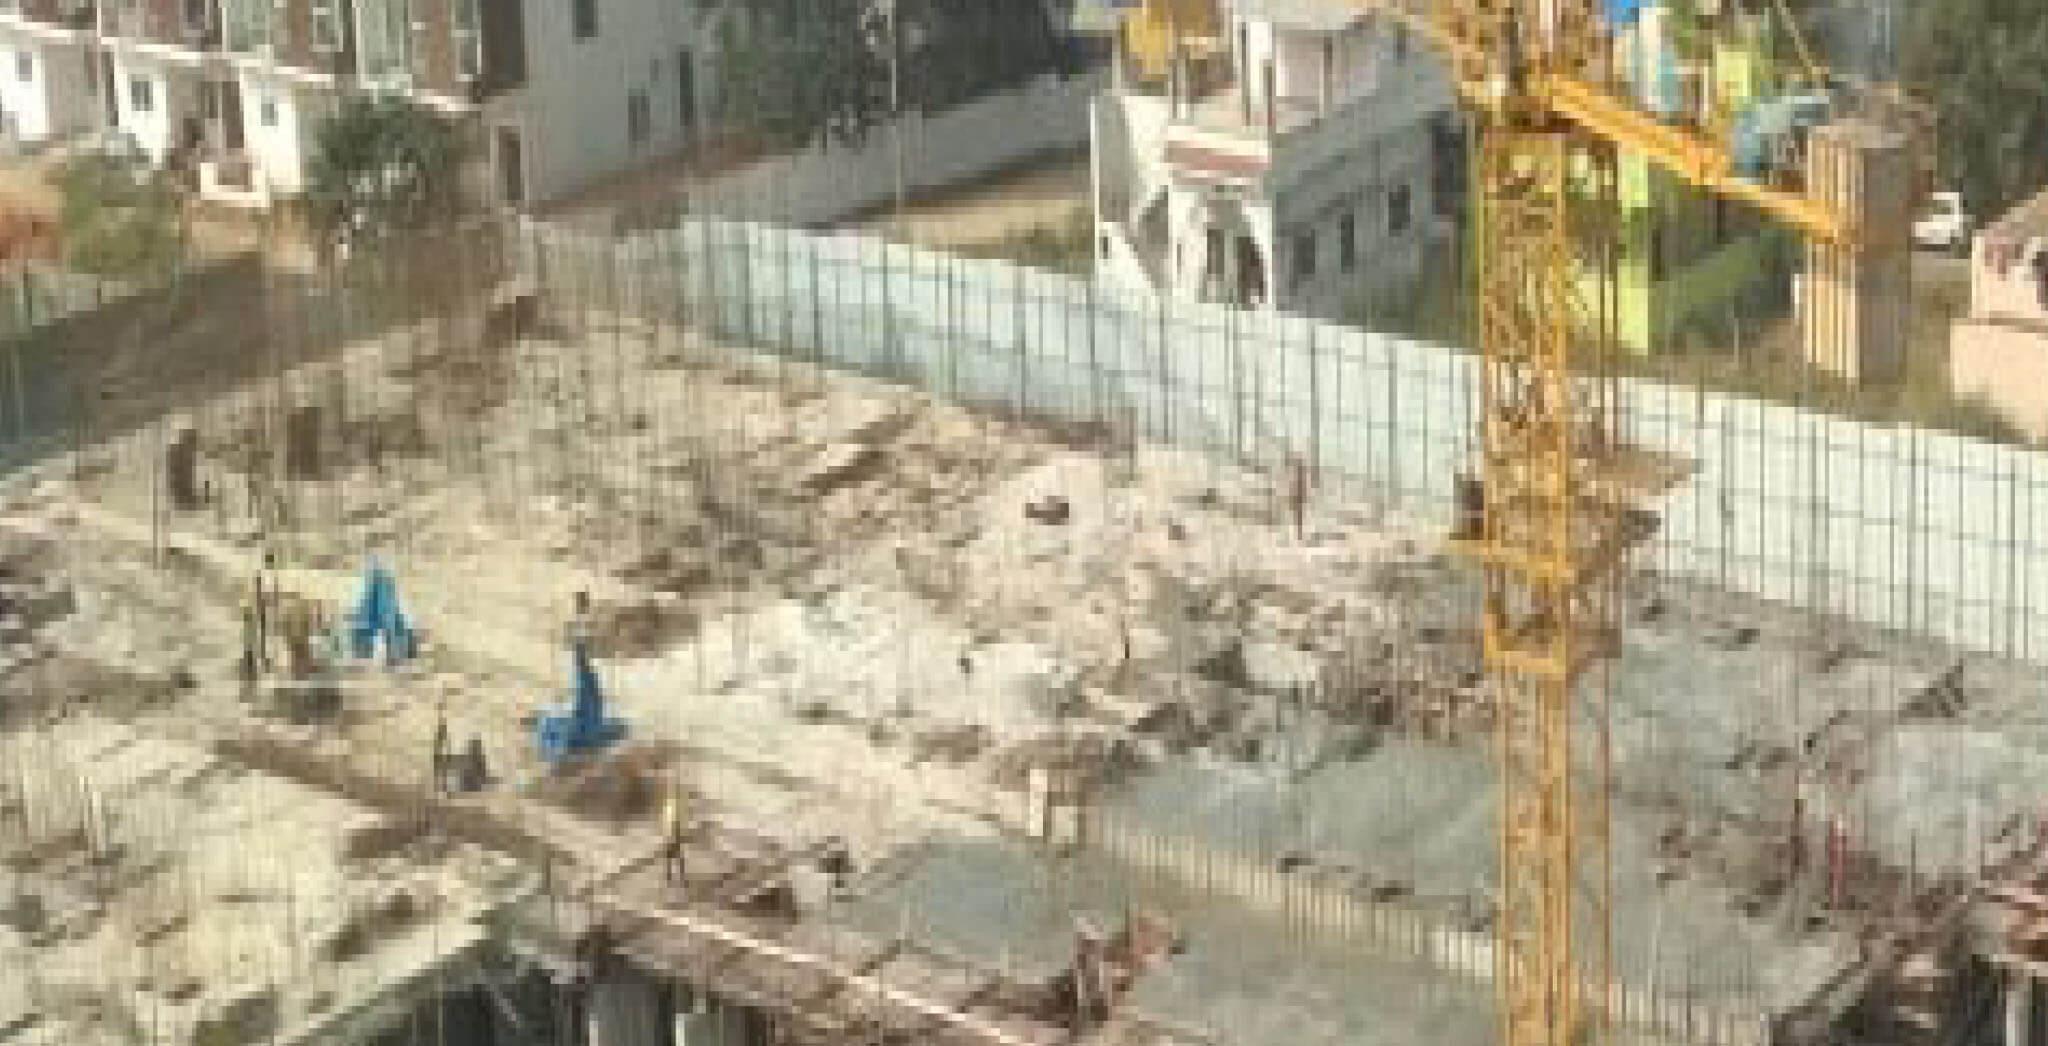 Jan 2020 - G Block: Ground floor slab completed